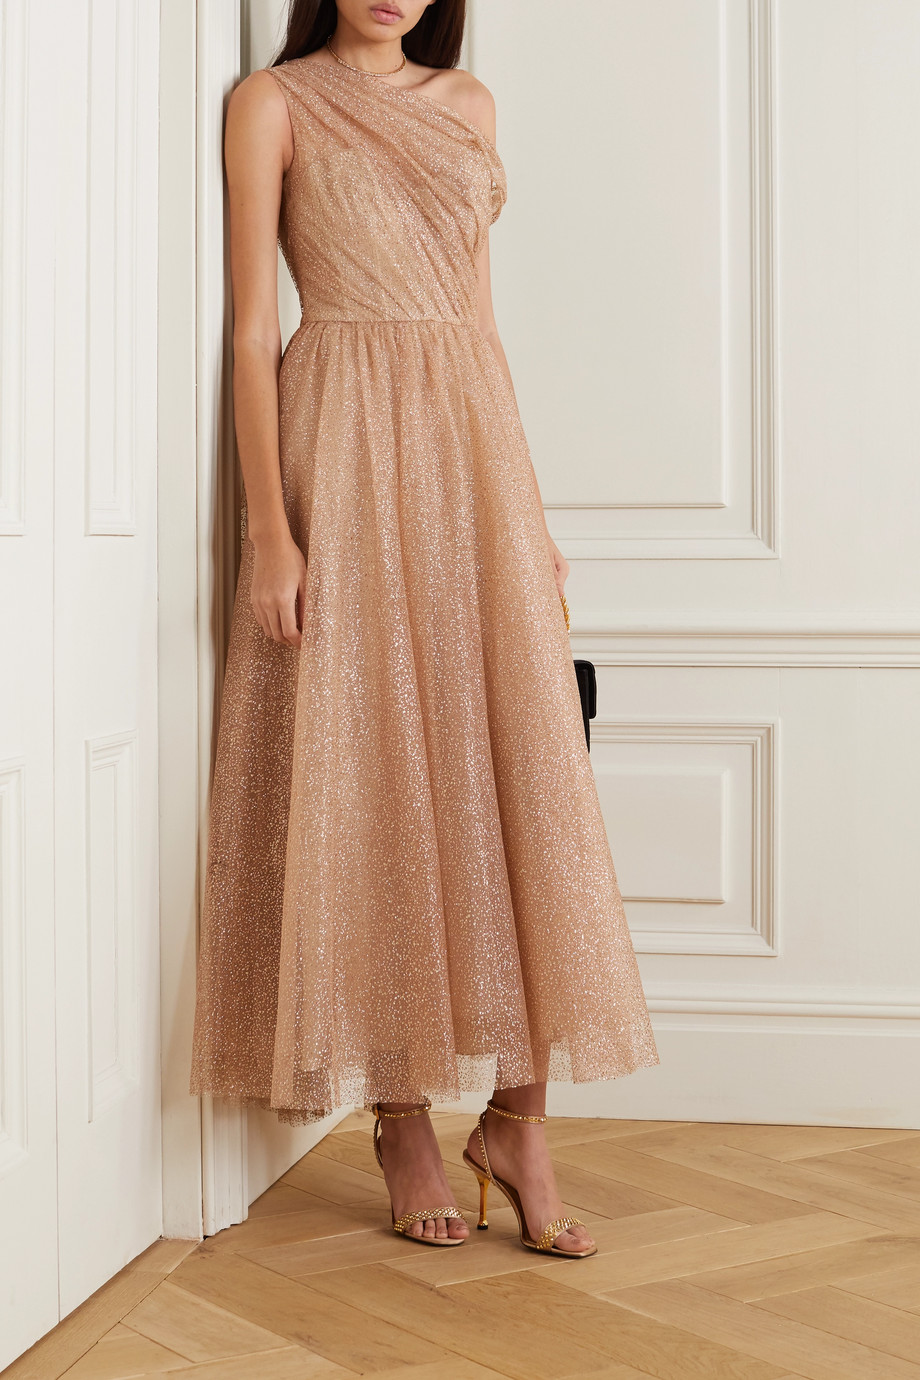 Monique Lhuillier One-shoulder glittered tulle gown